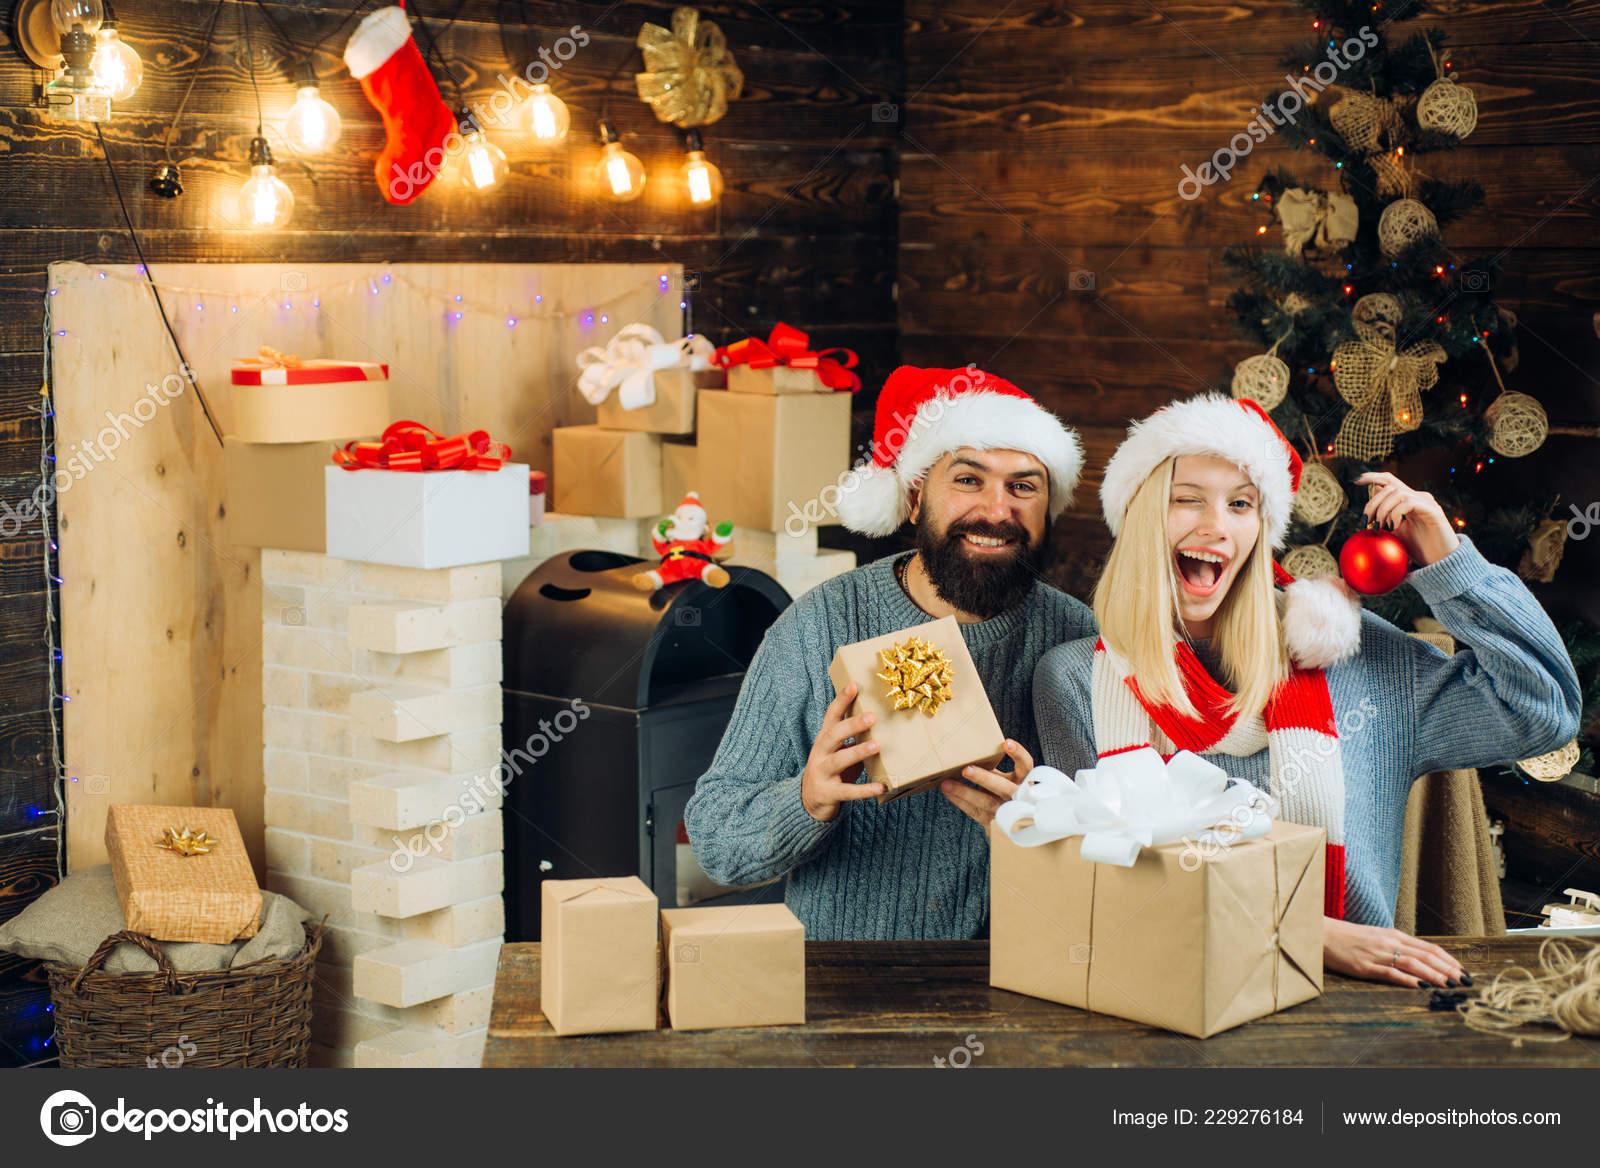 Geschenkideen Familie Weihnachten.Positive Emotionen Mimik Weihnachten Interieur Familie Weihnachten